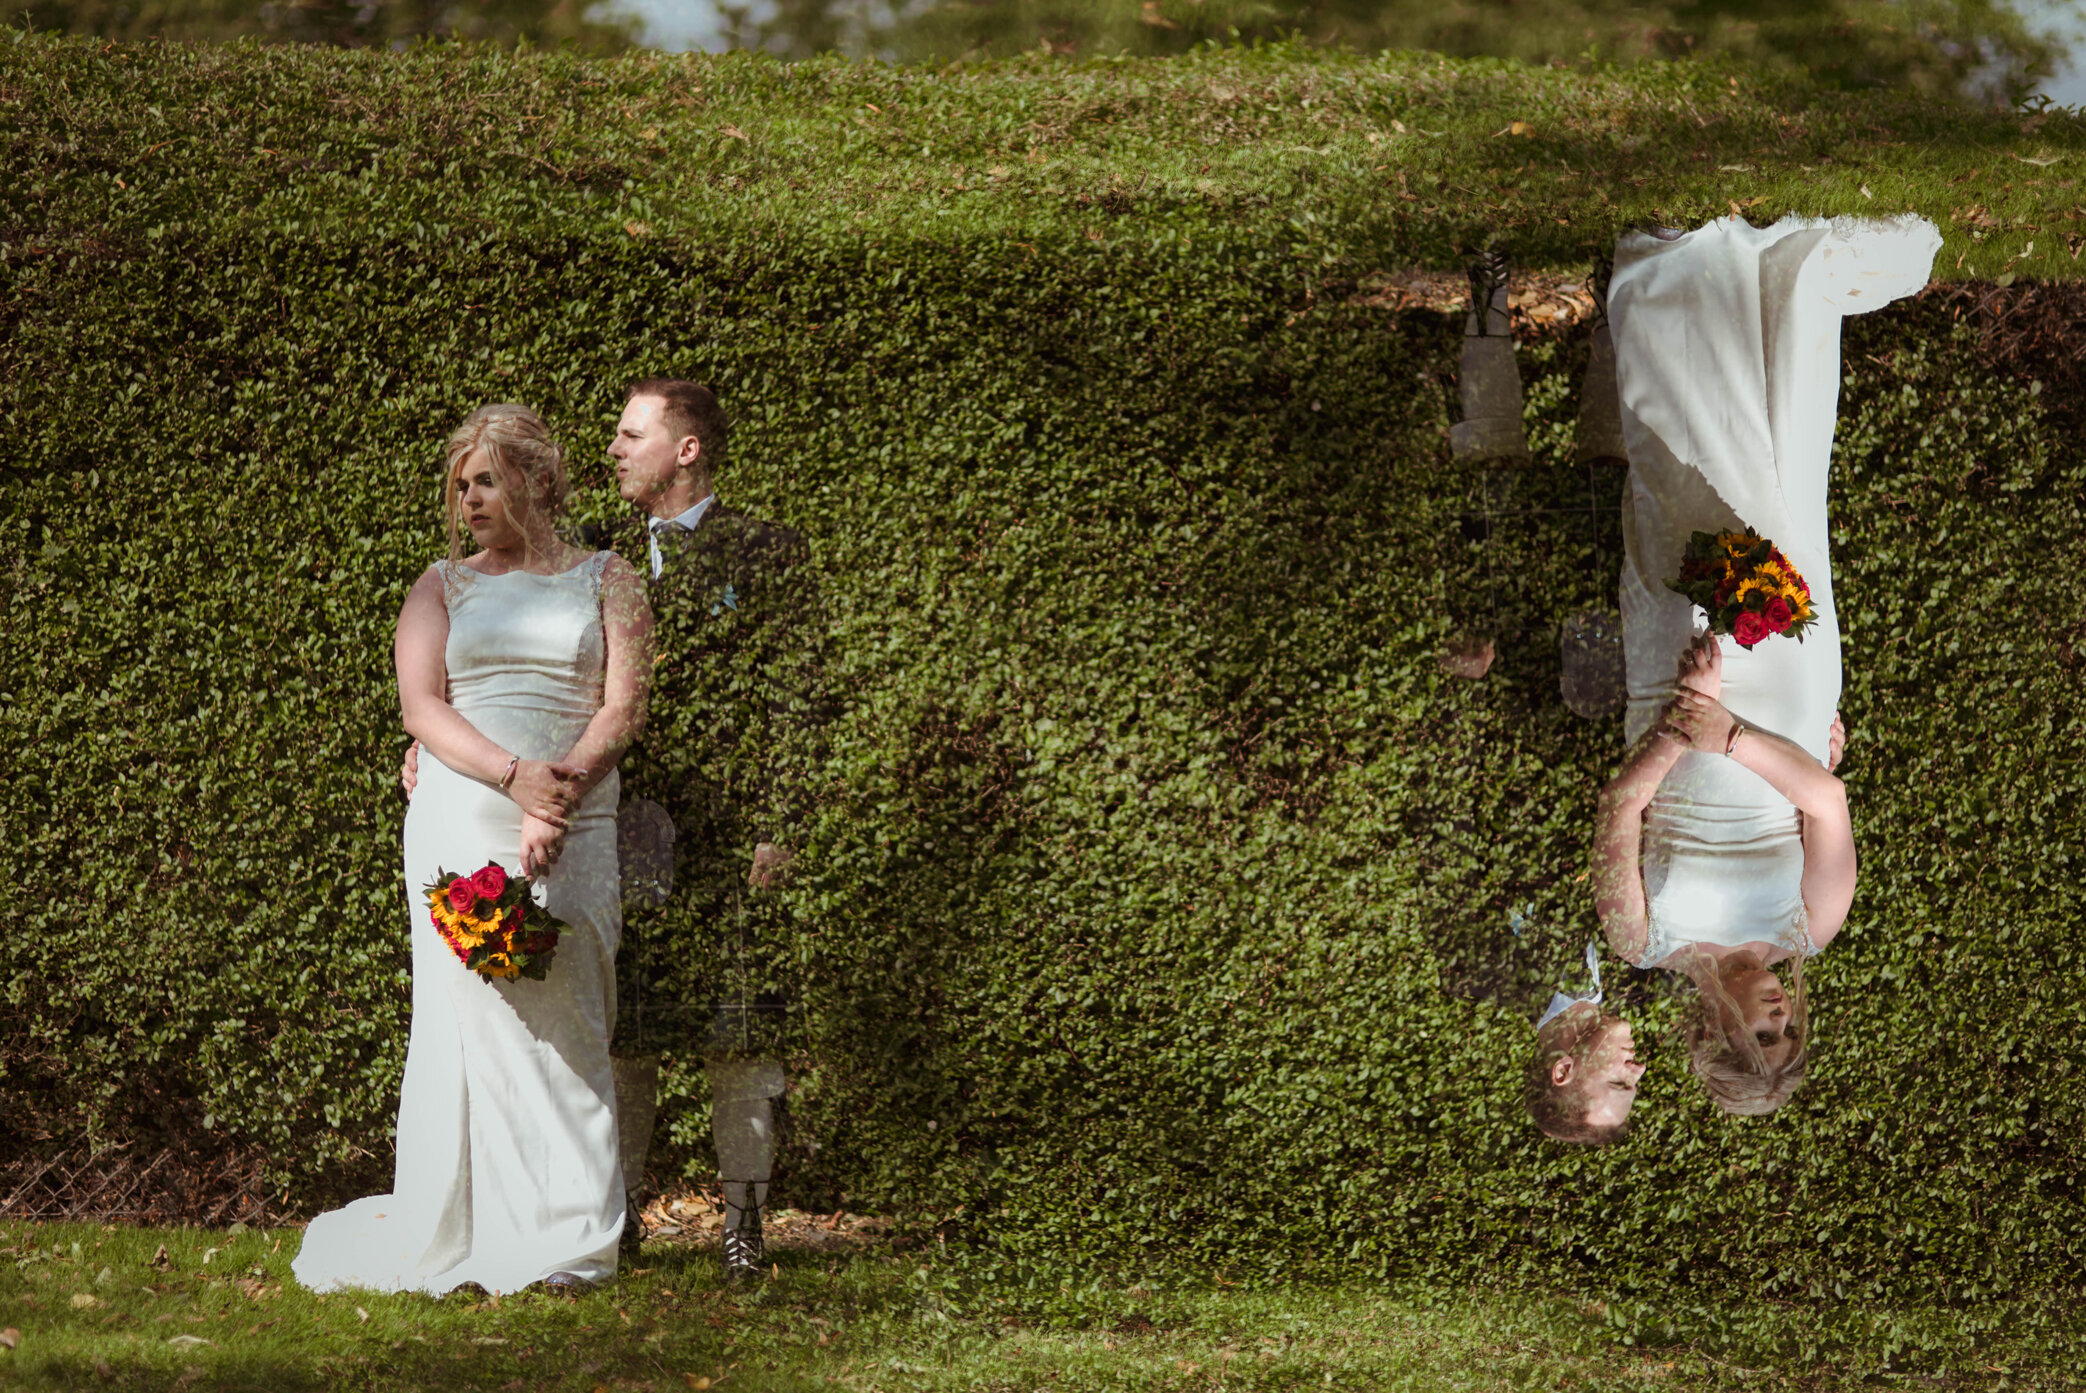 alternative-wedding-photography-glasgow-dumbarton (1).jpg